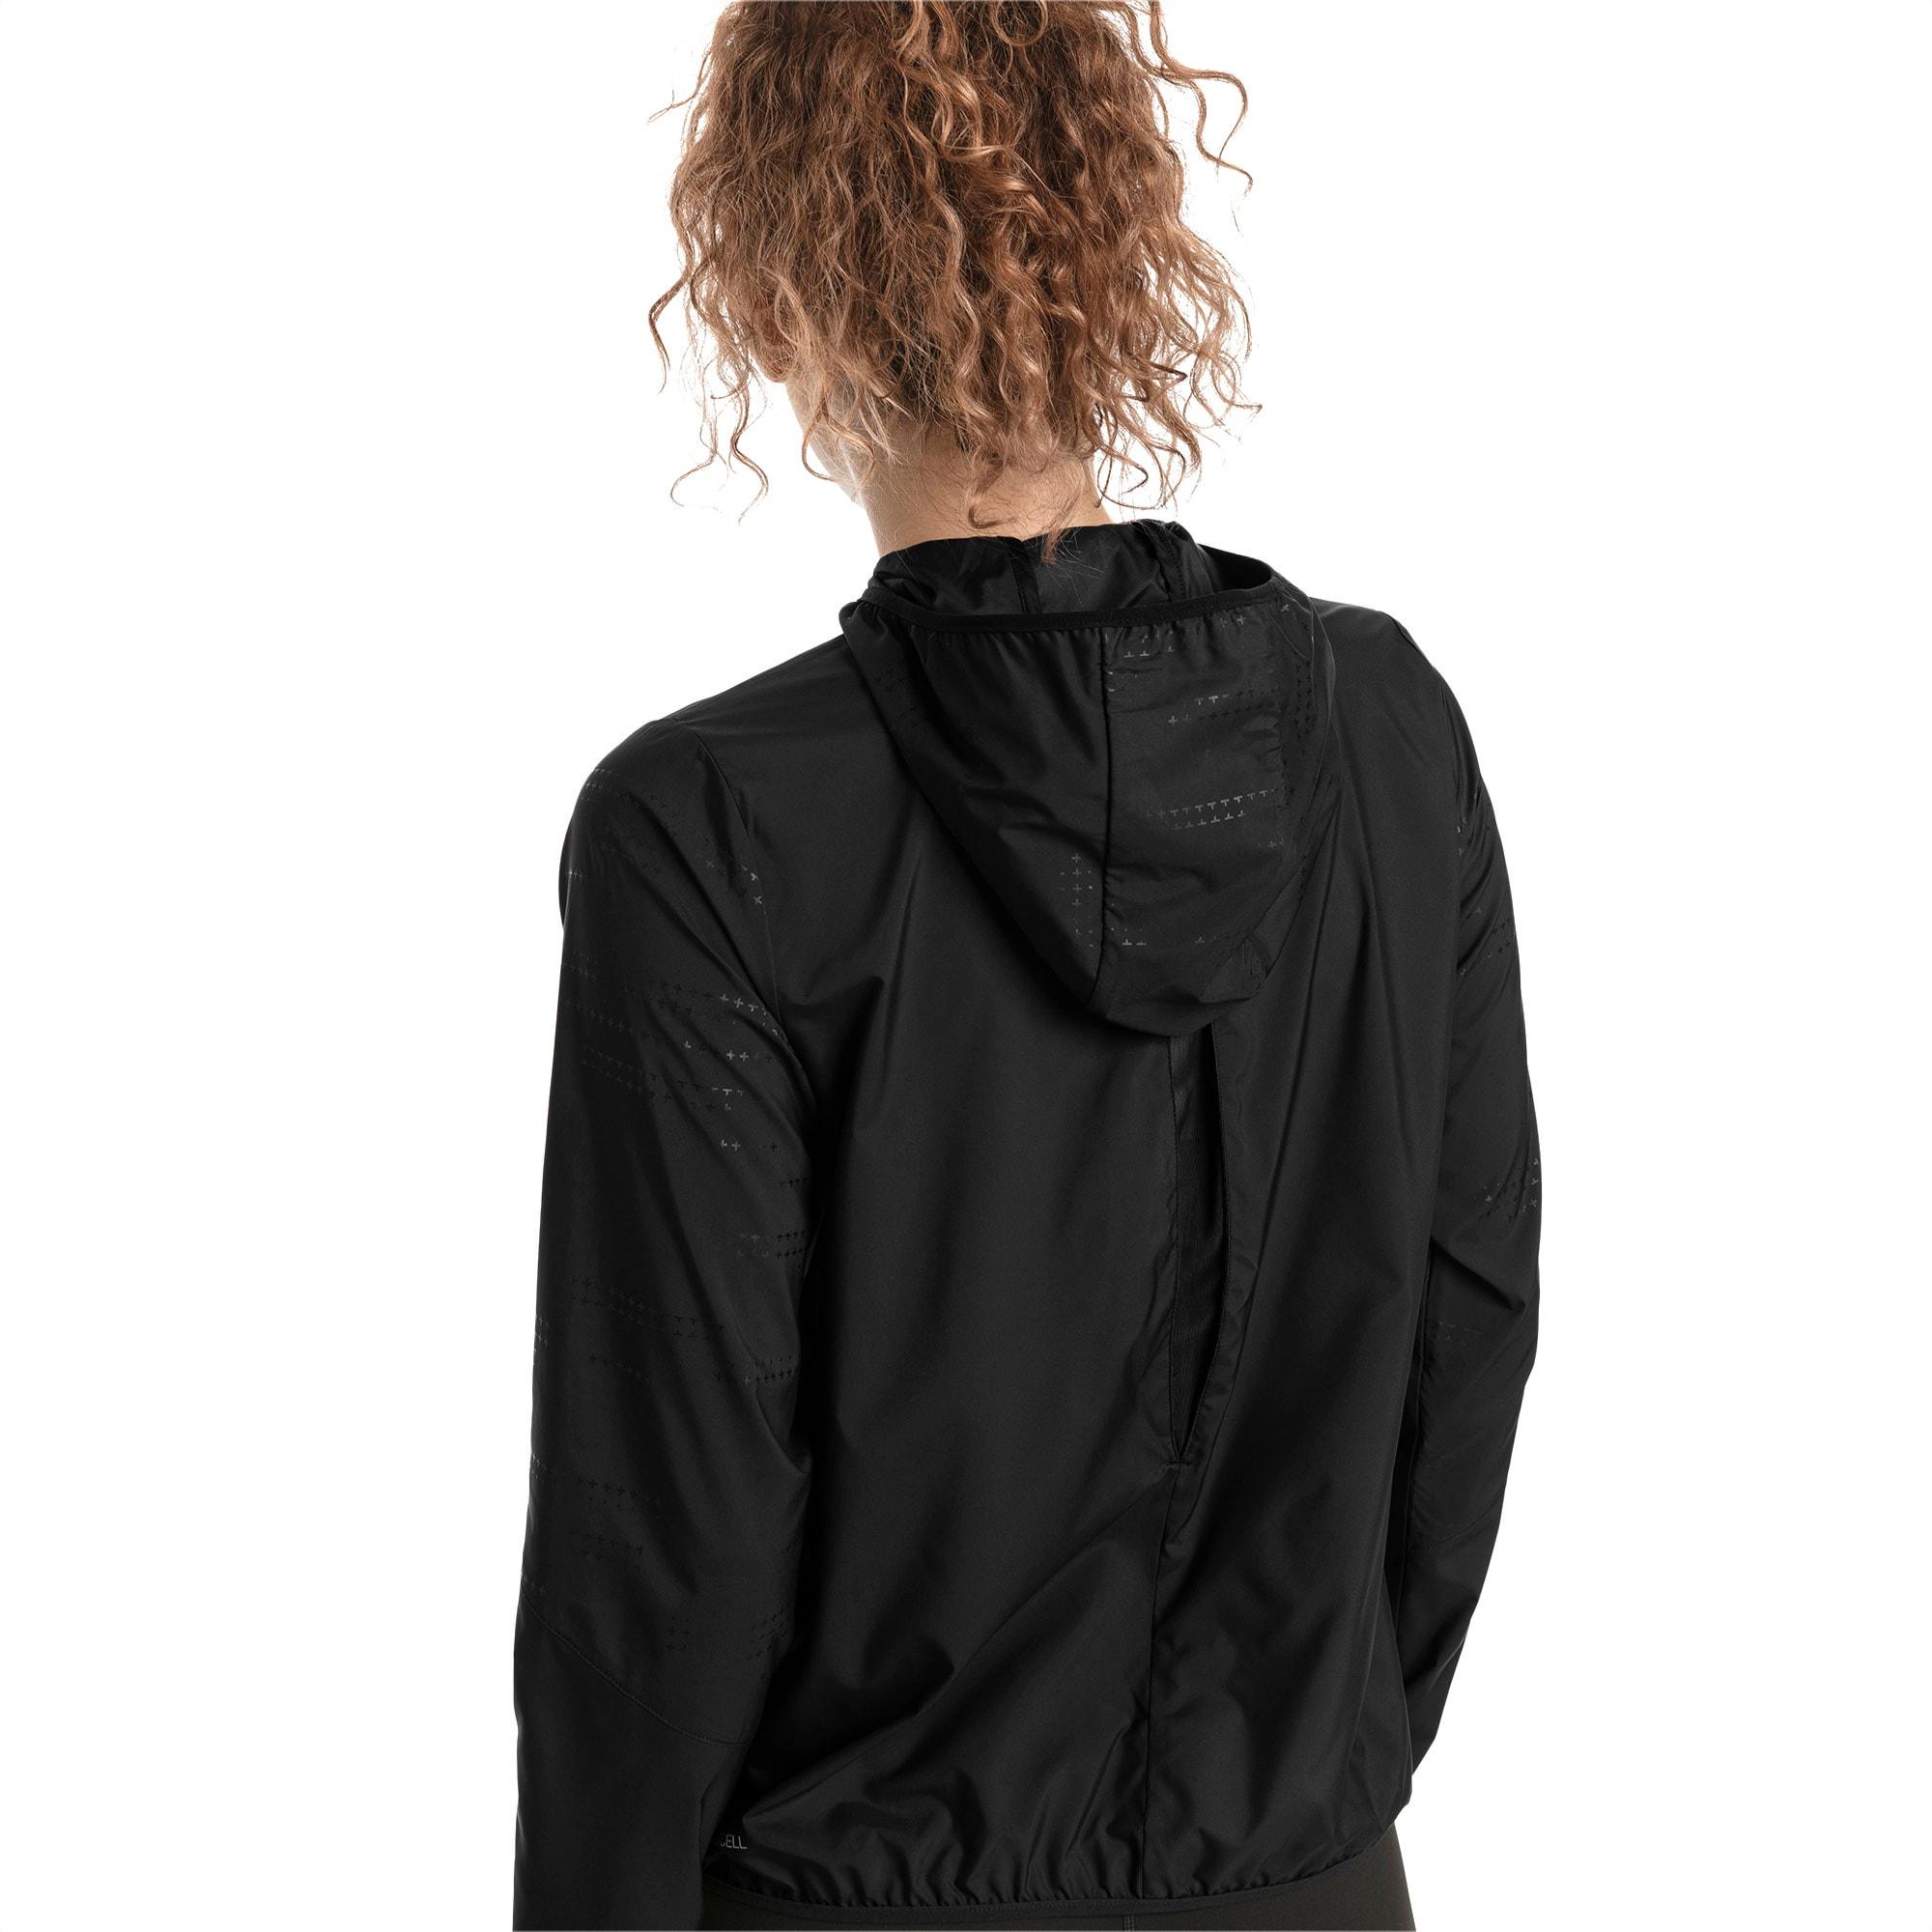 Puma Women's Ignite Wind Jacket